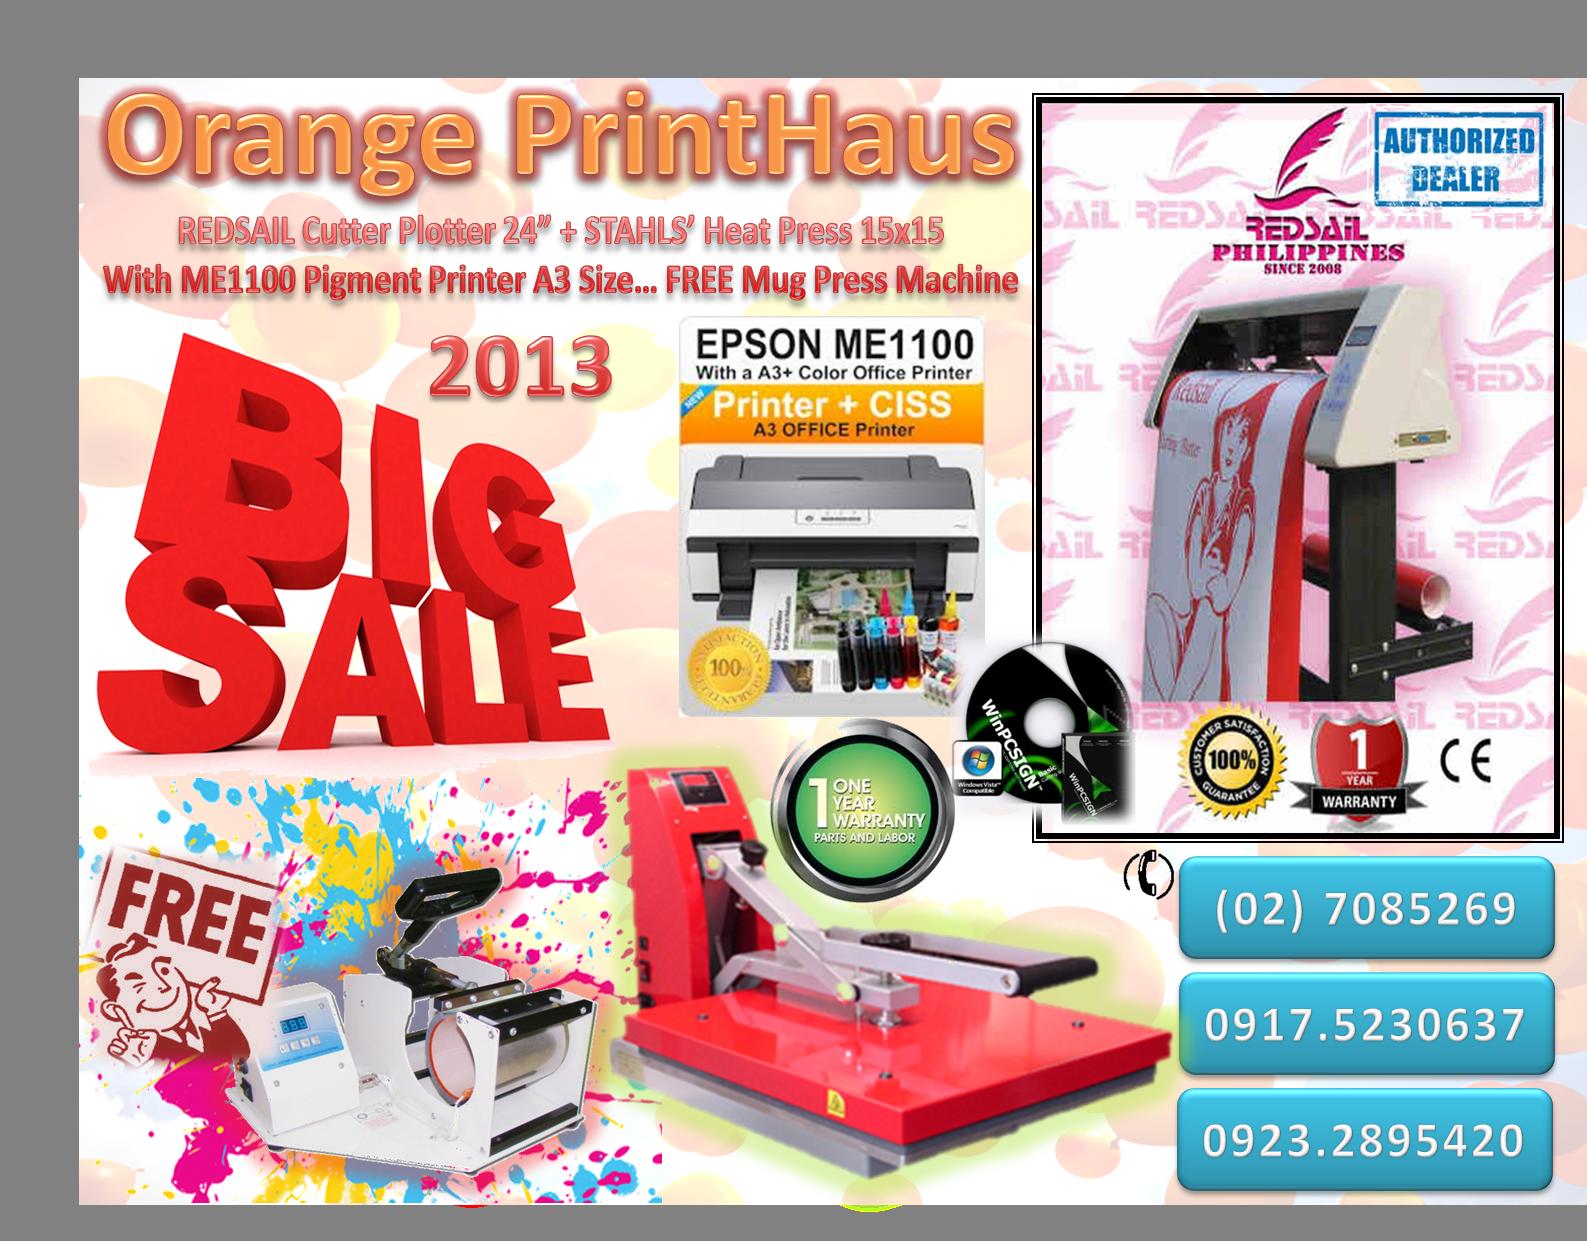 Free Mug Press For A Digital Printing Package Orange